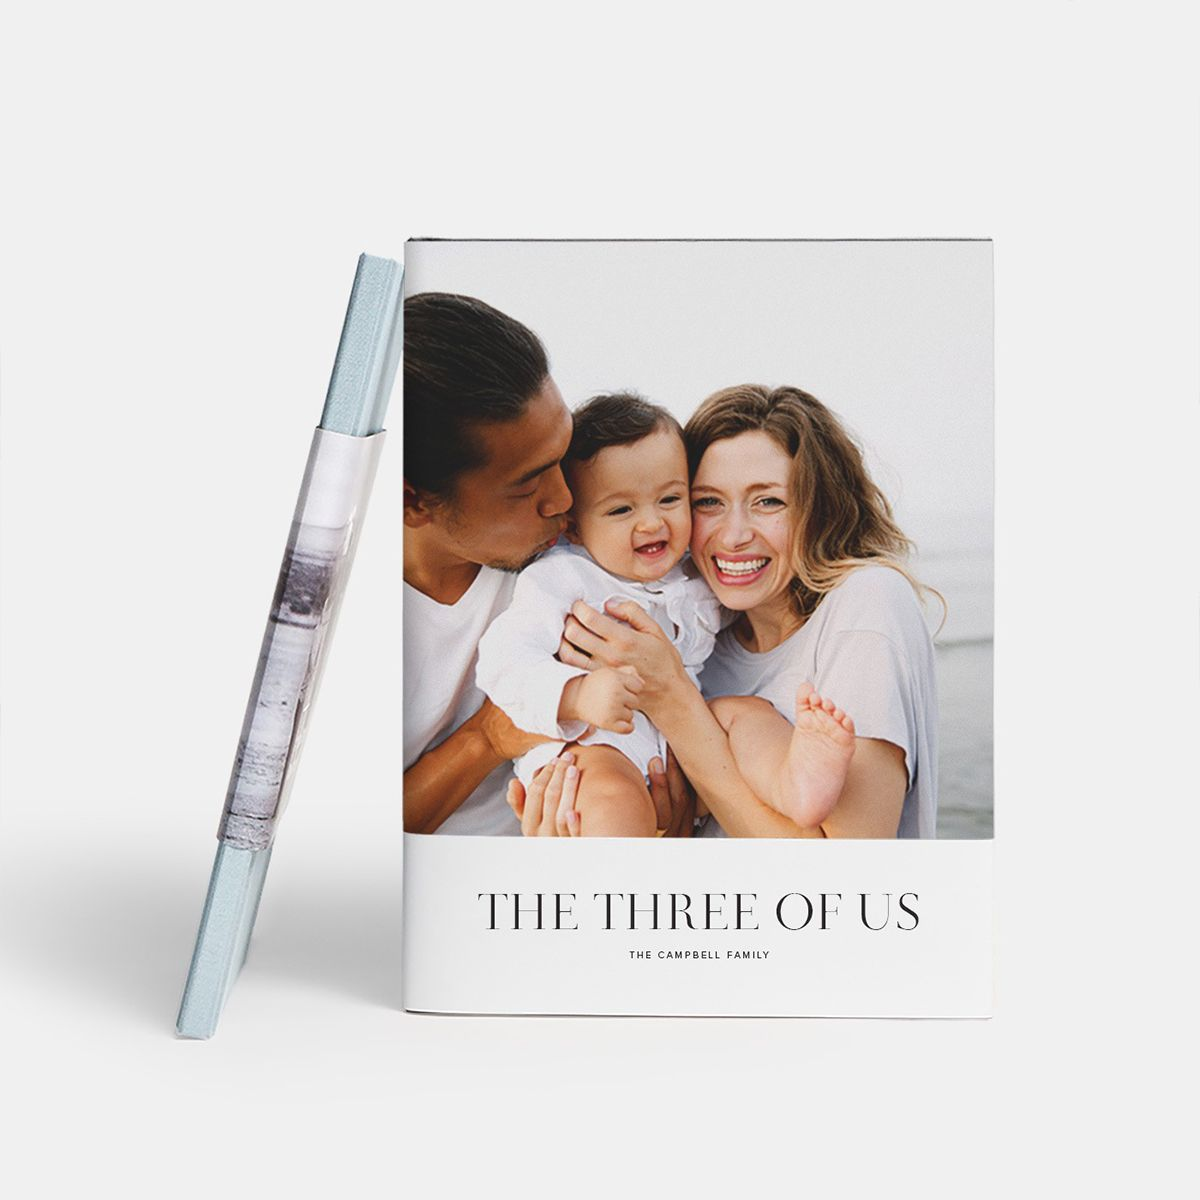 hardcover-main01-the-three-of-us_2x_1.jpeg